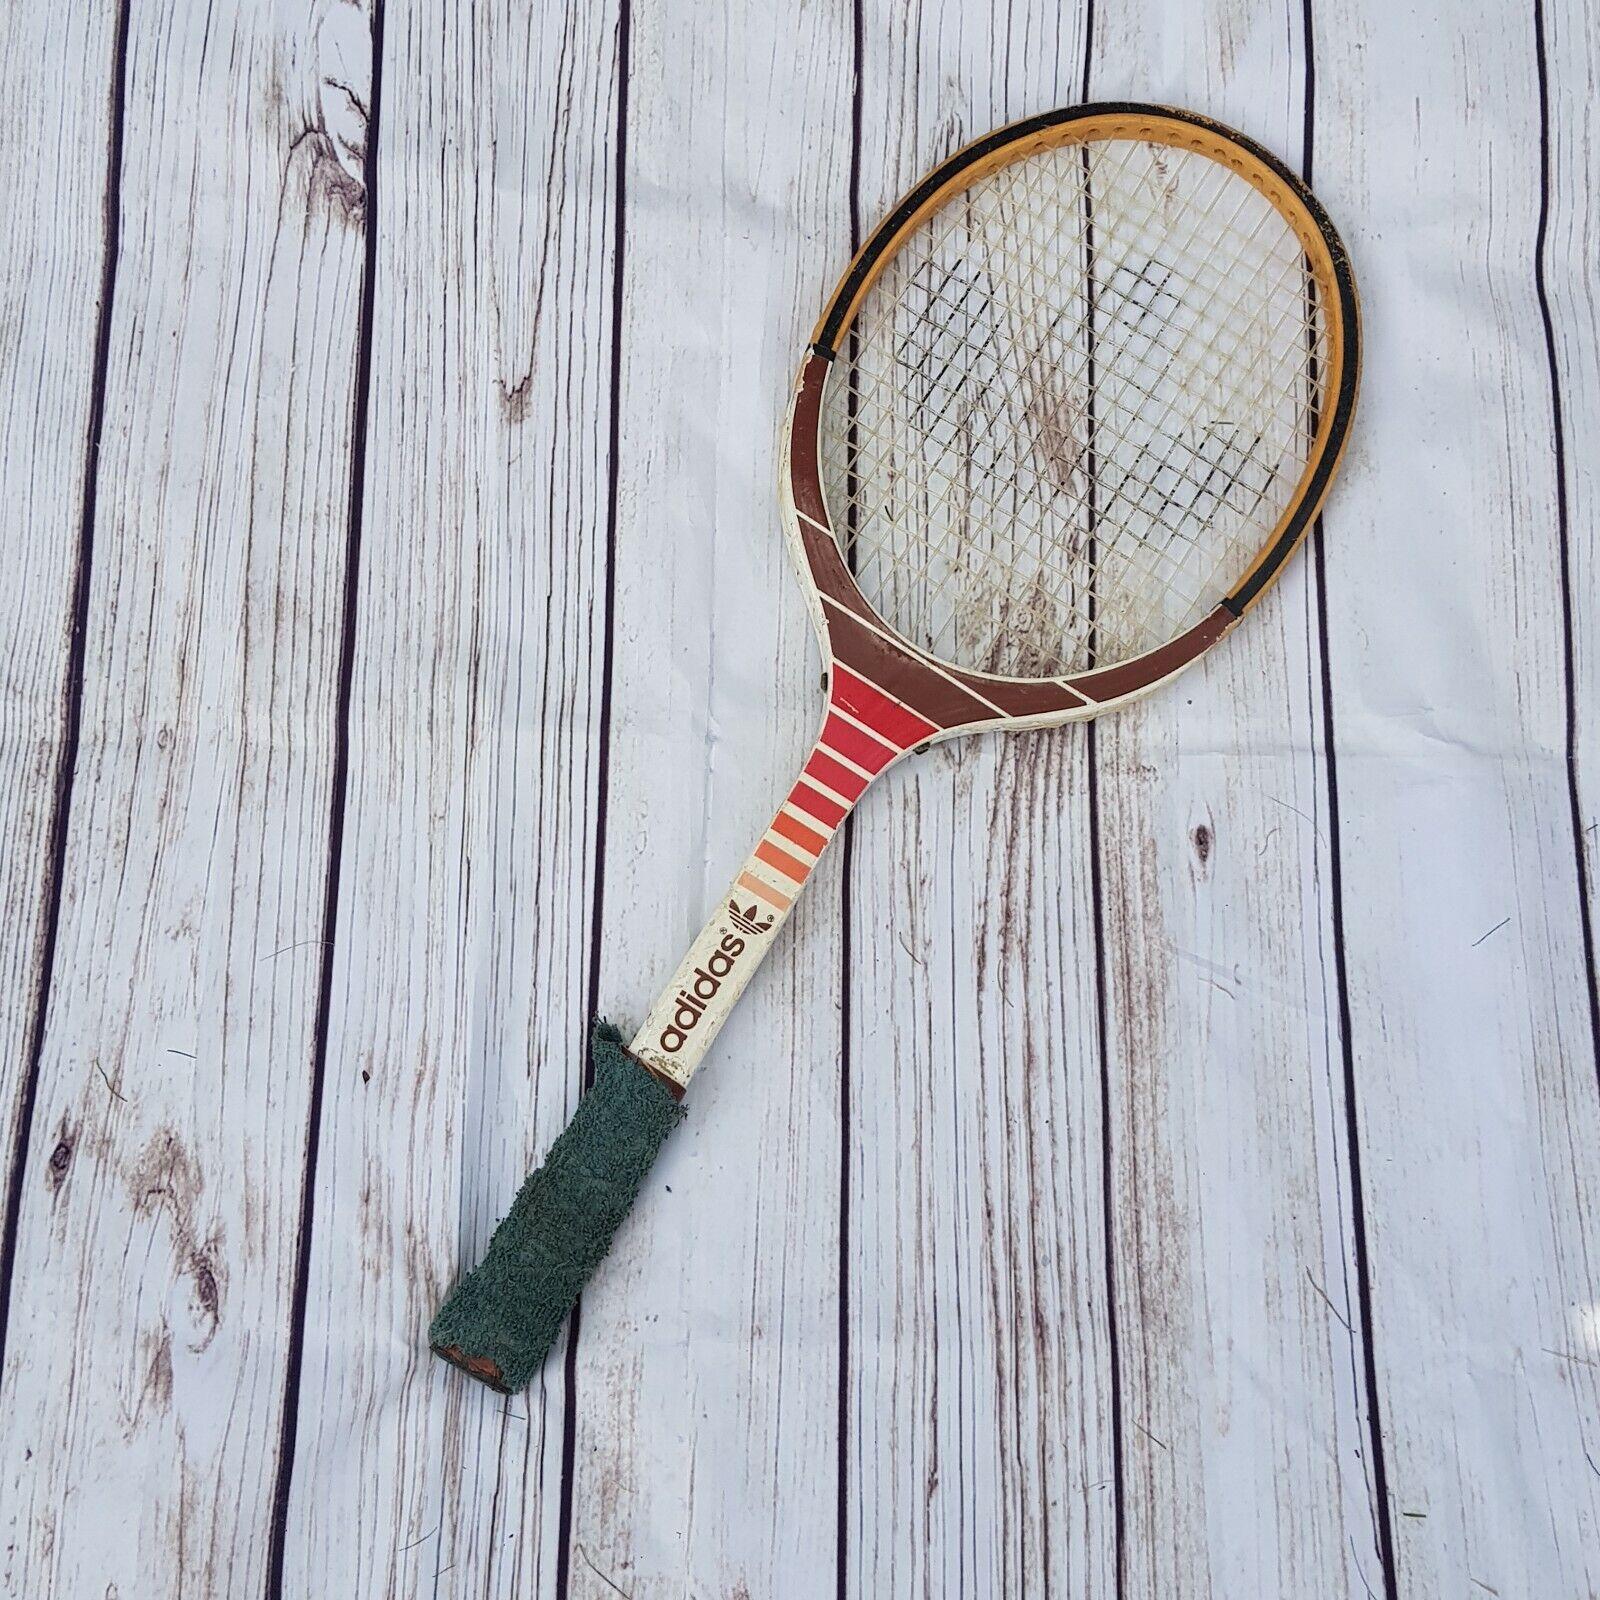 Vintage Adidas Originals Ads 540 Wooden Tennis Racket Florence De La Courtie For Sale Ebay